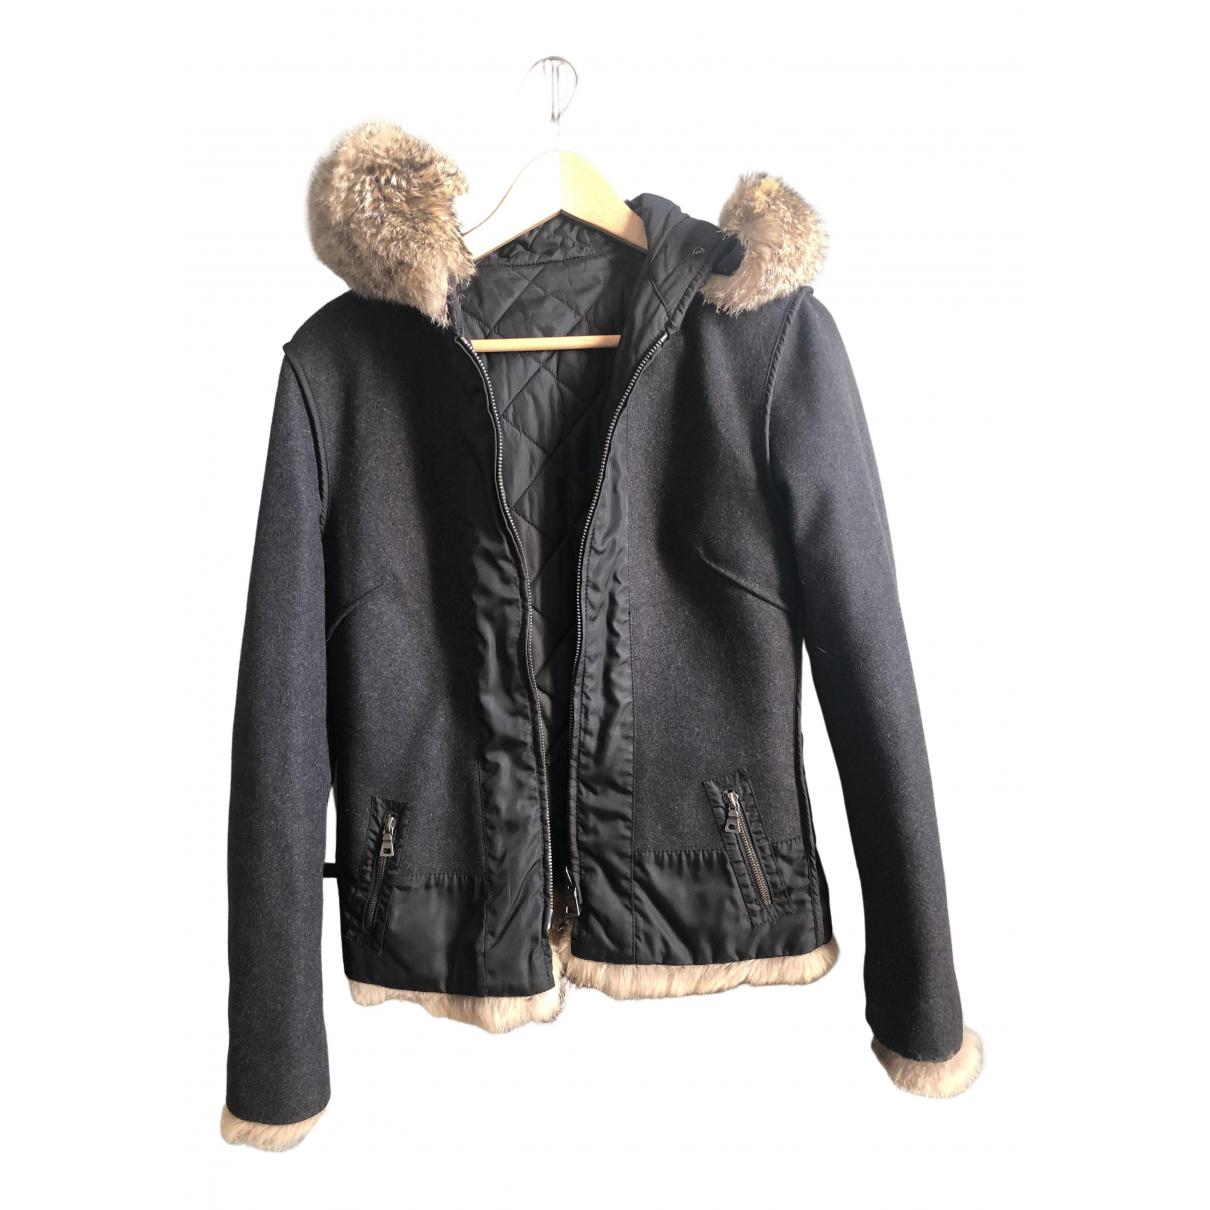 Prada - Manteau   pour femme en renard - anthracite